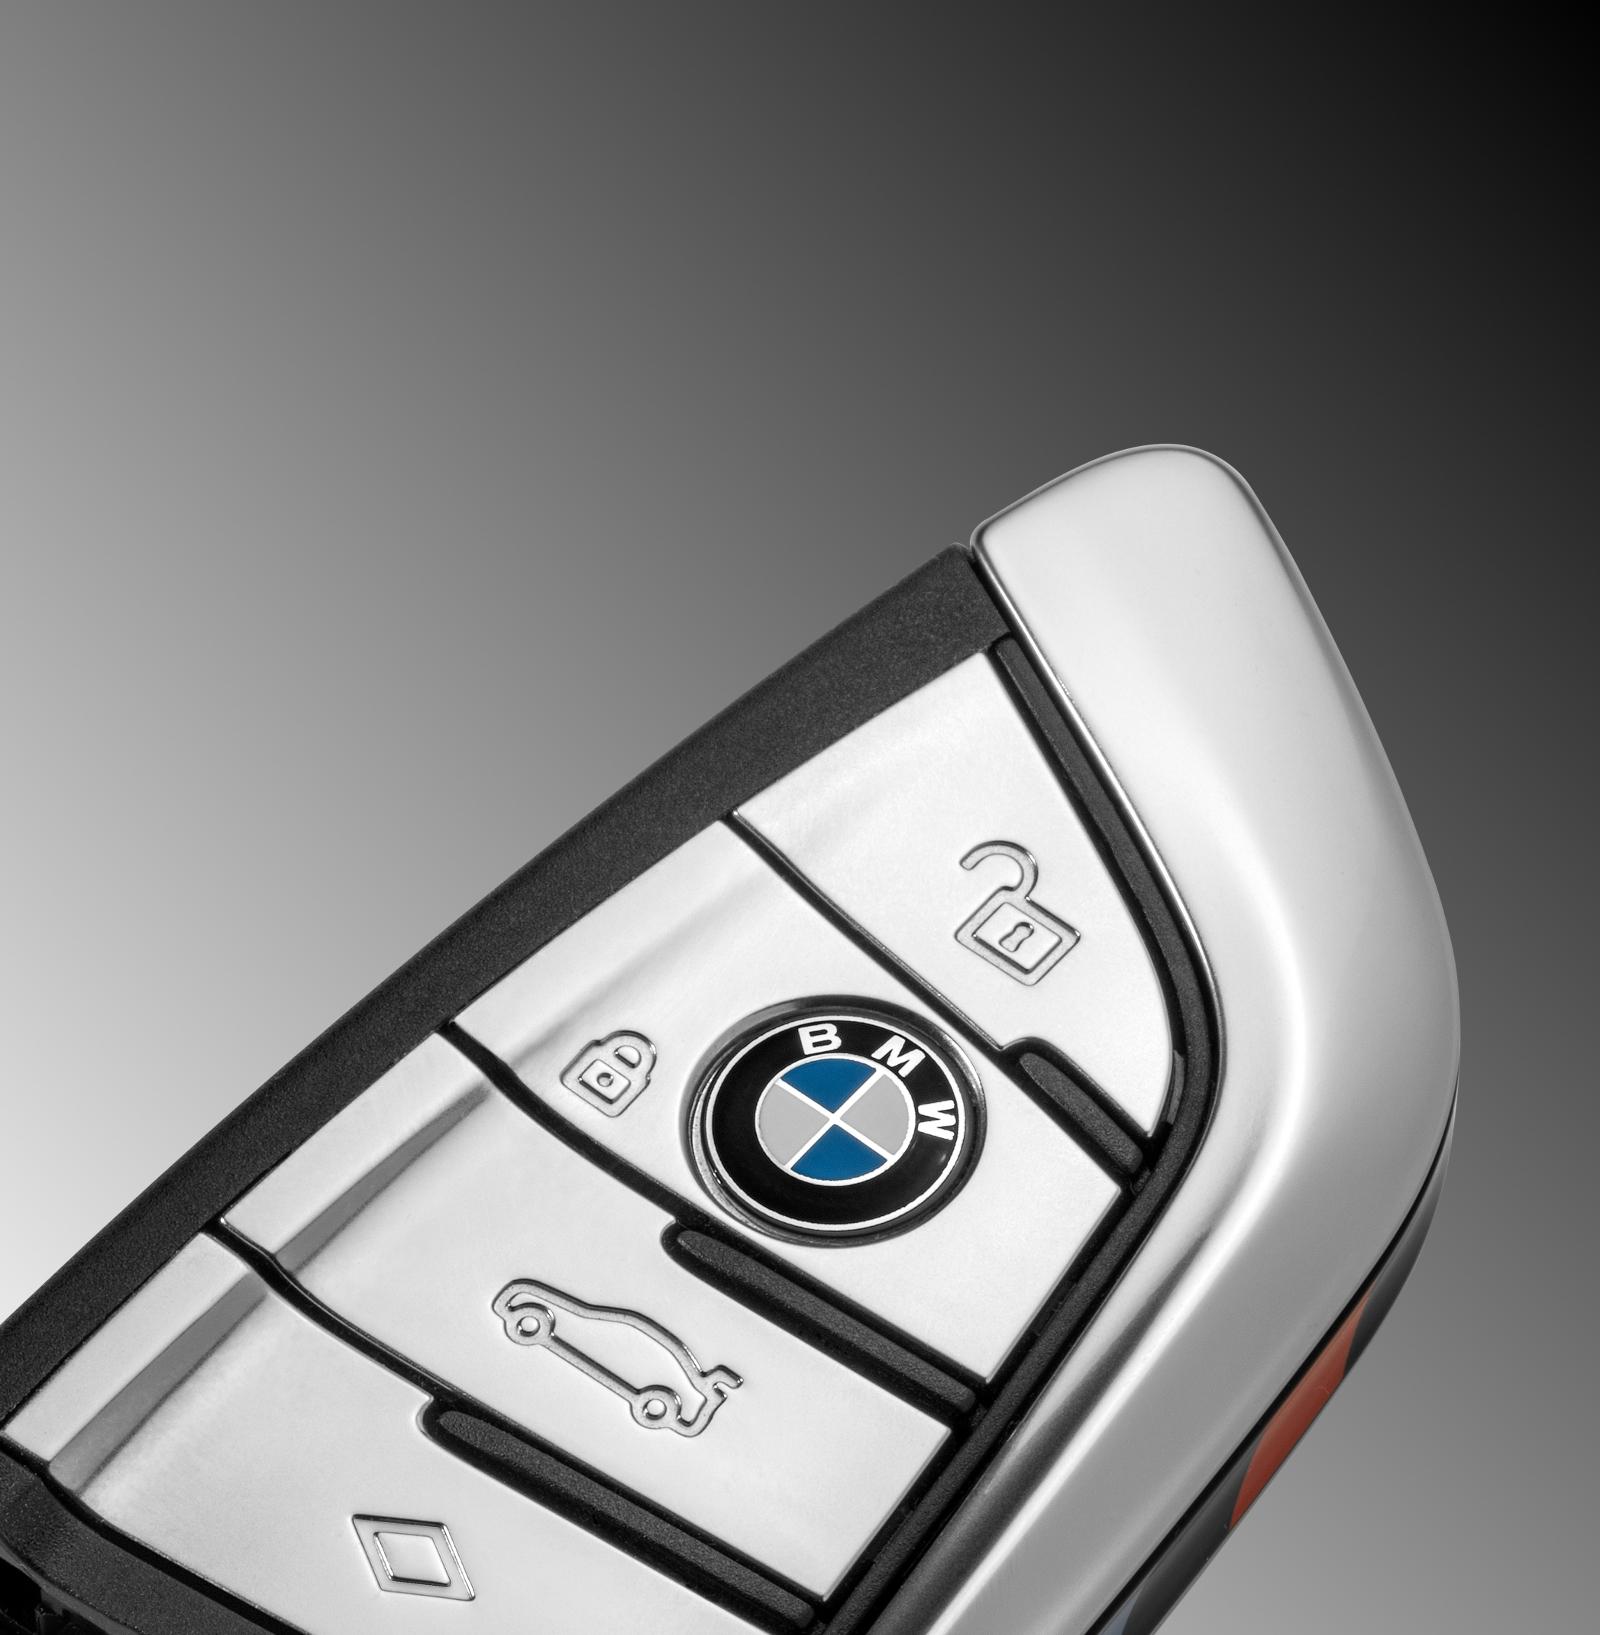 https://hdo-gmbh.com/wp-content/uploads/HDO_Automotive_Schluesselkomponenten_Spange2.jpg